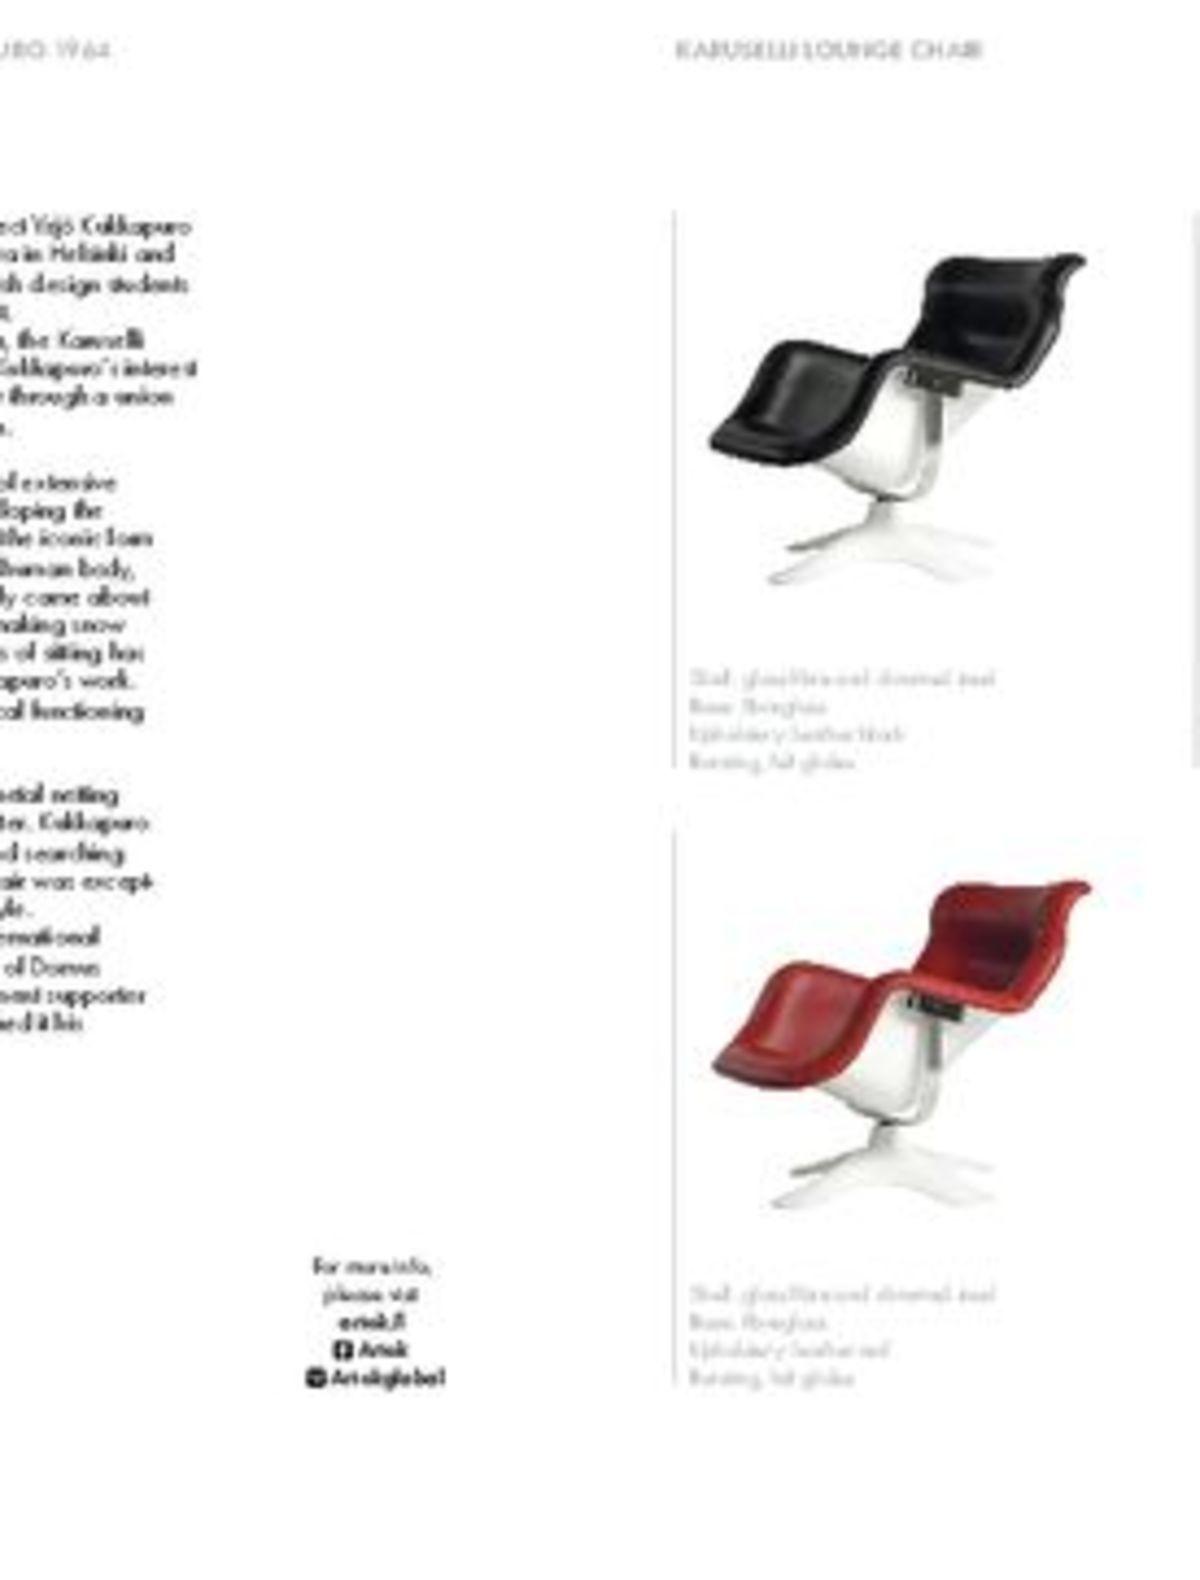 Product Leaflet Karuselli Lounge Chair